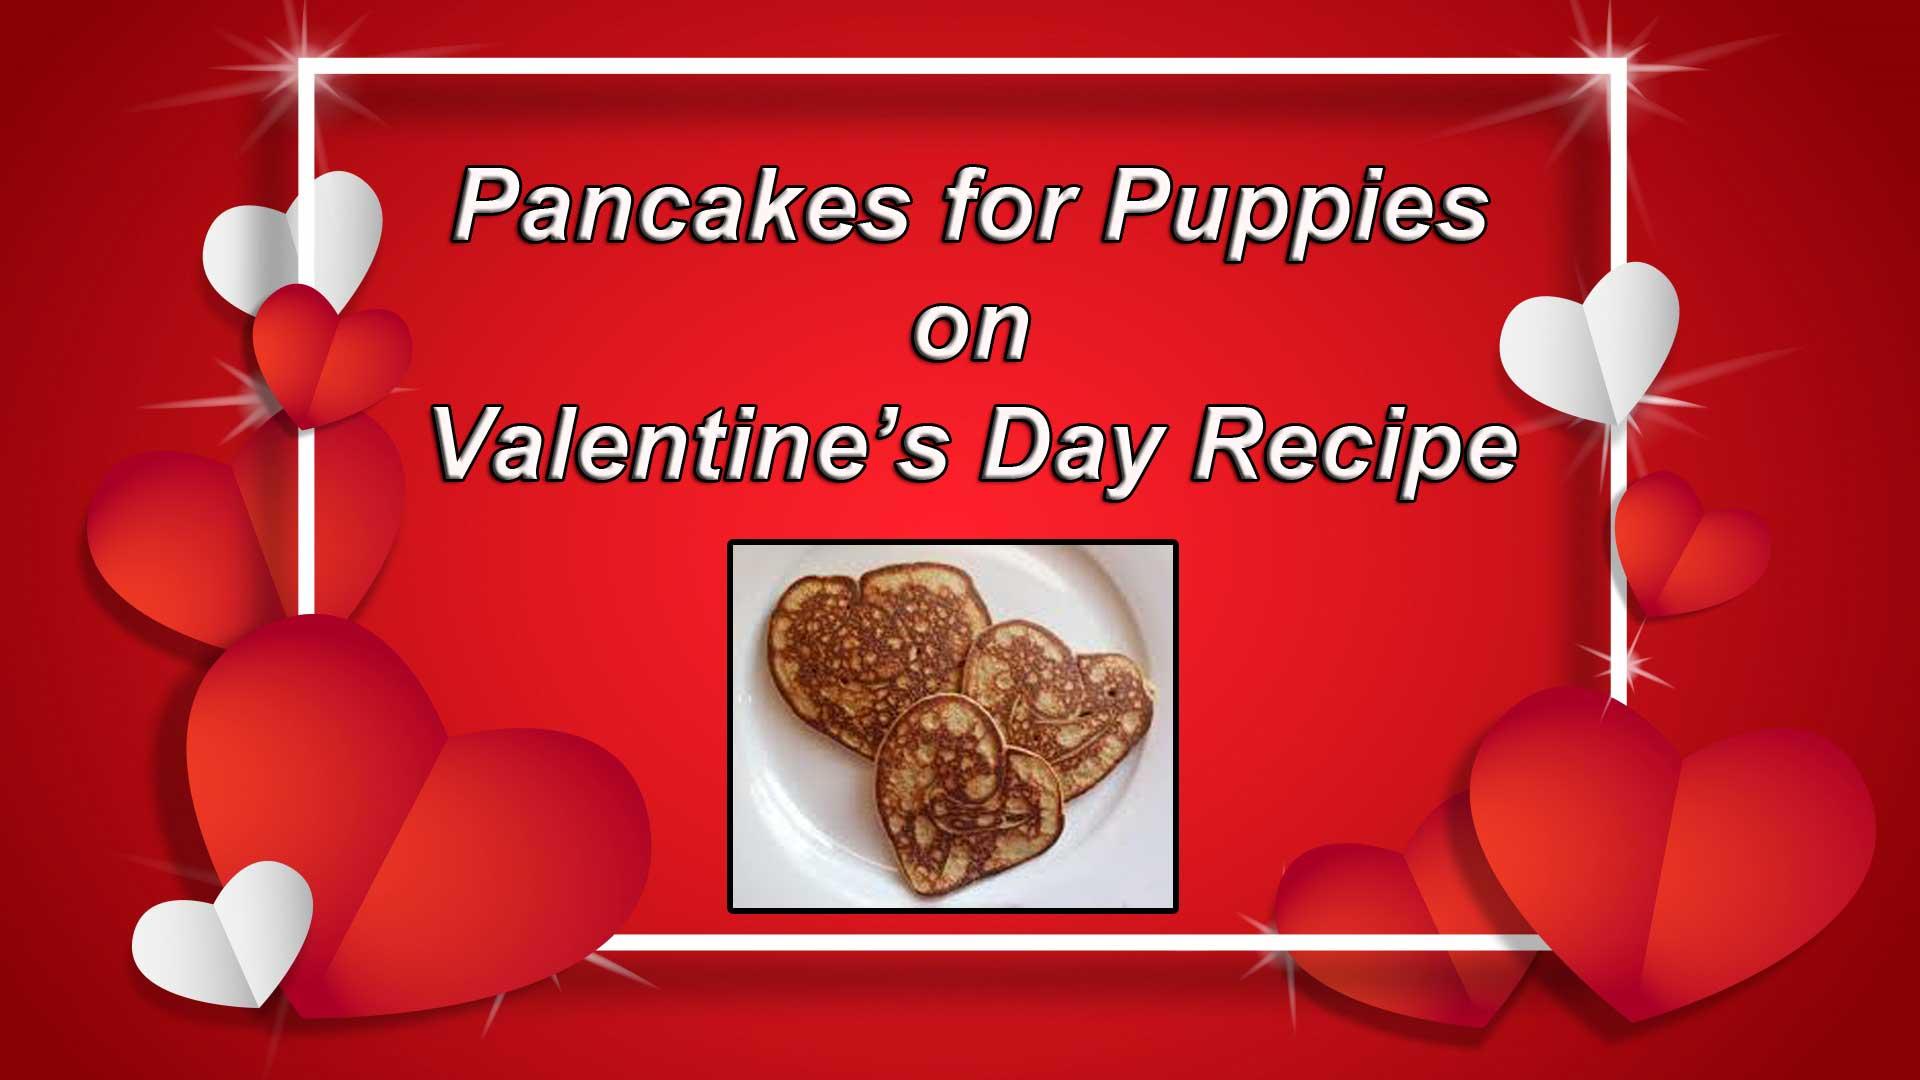 image of heart shaped pancakes